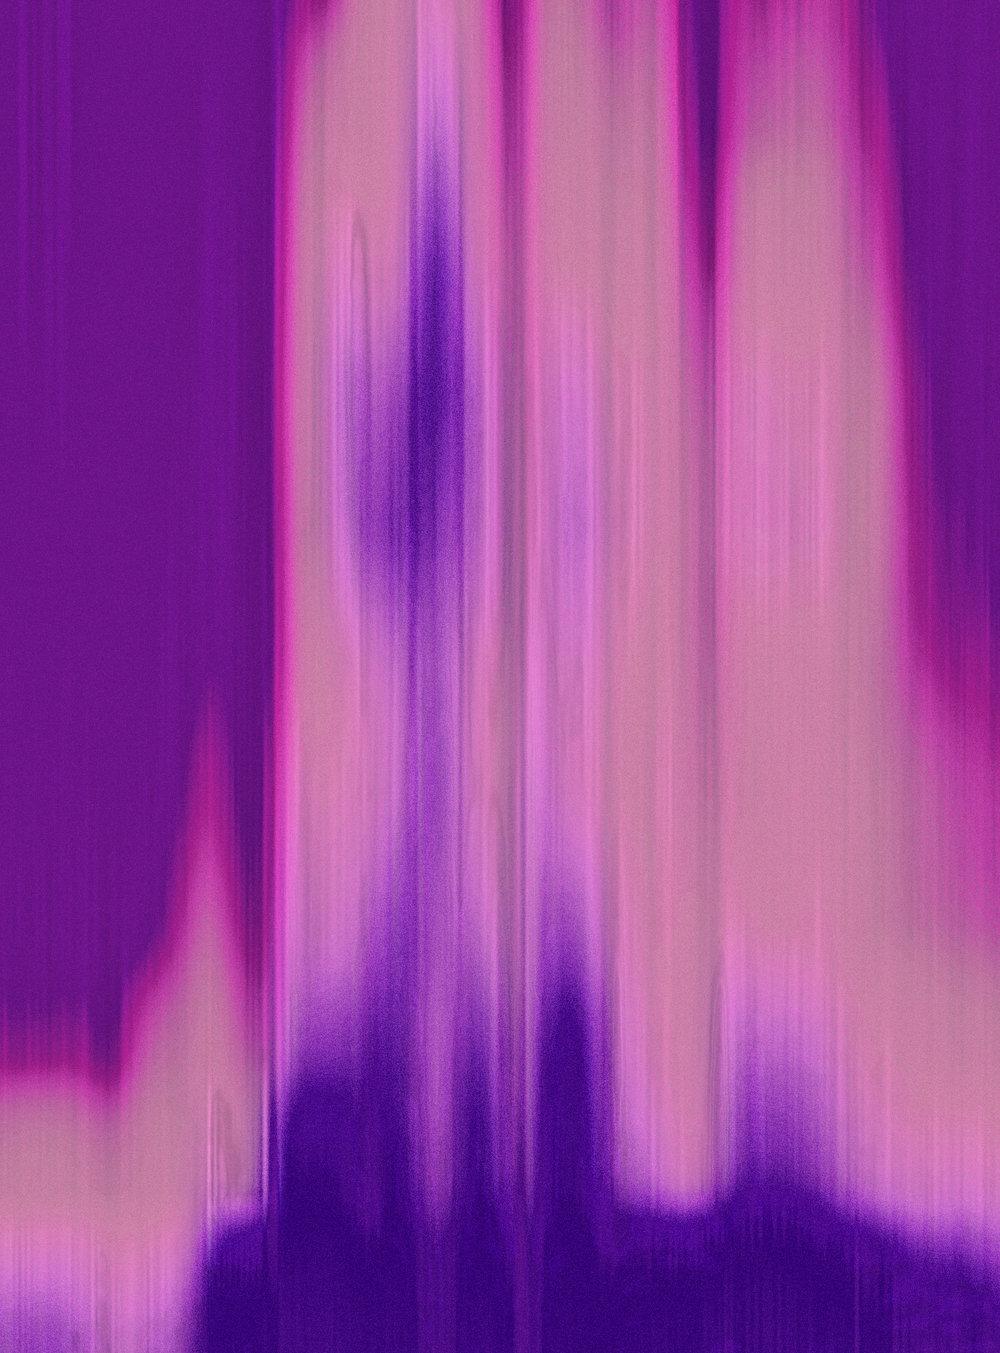 Spectogram_3.jpg